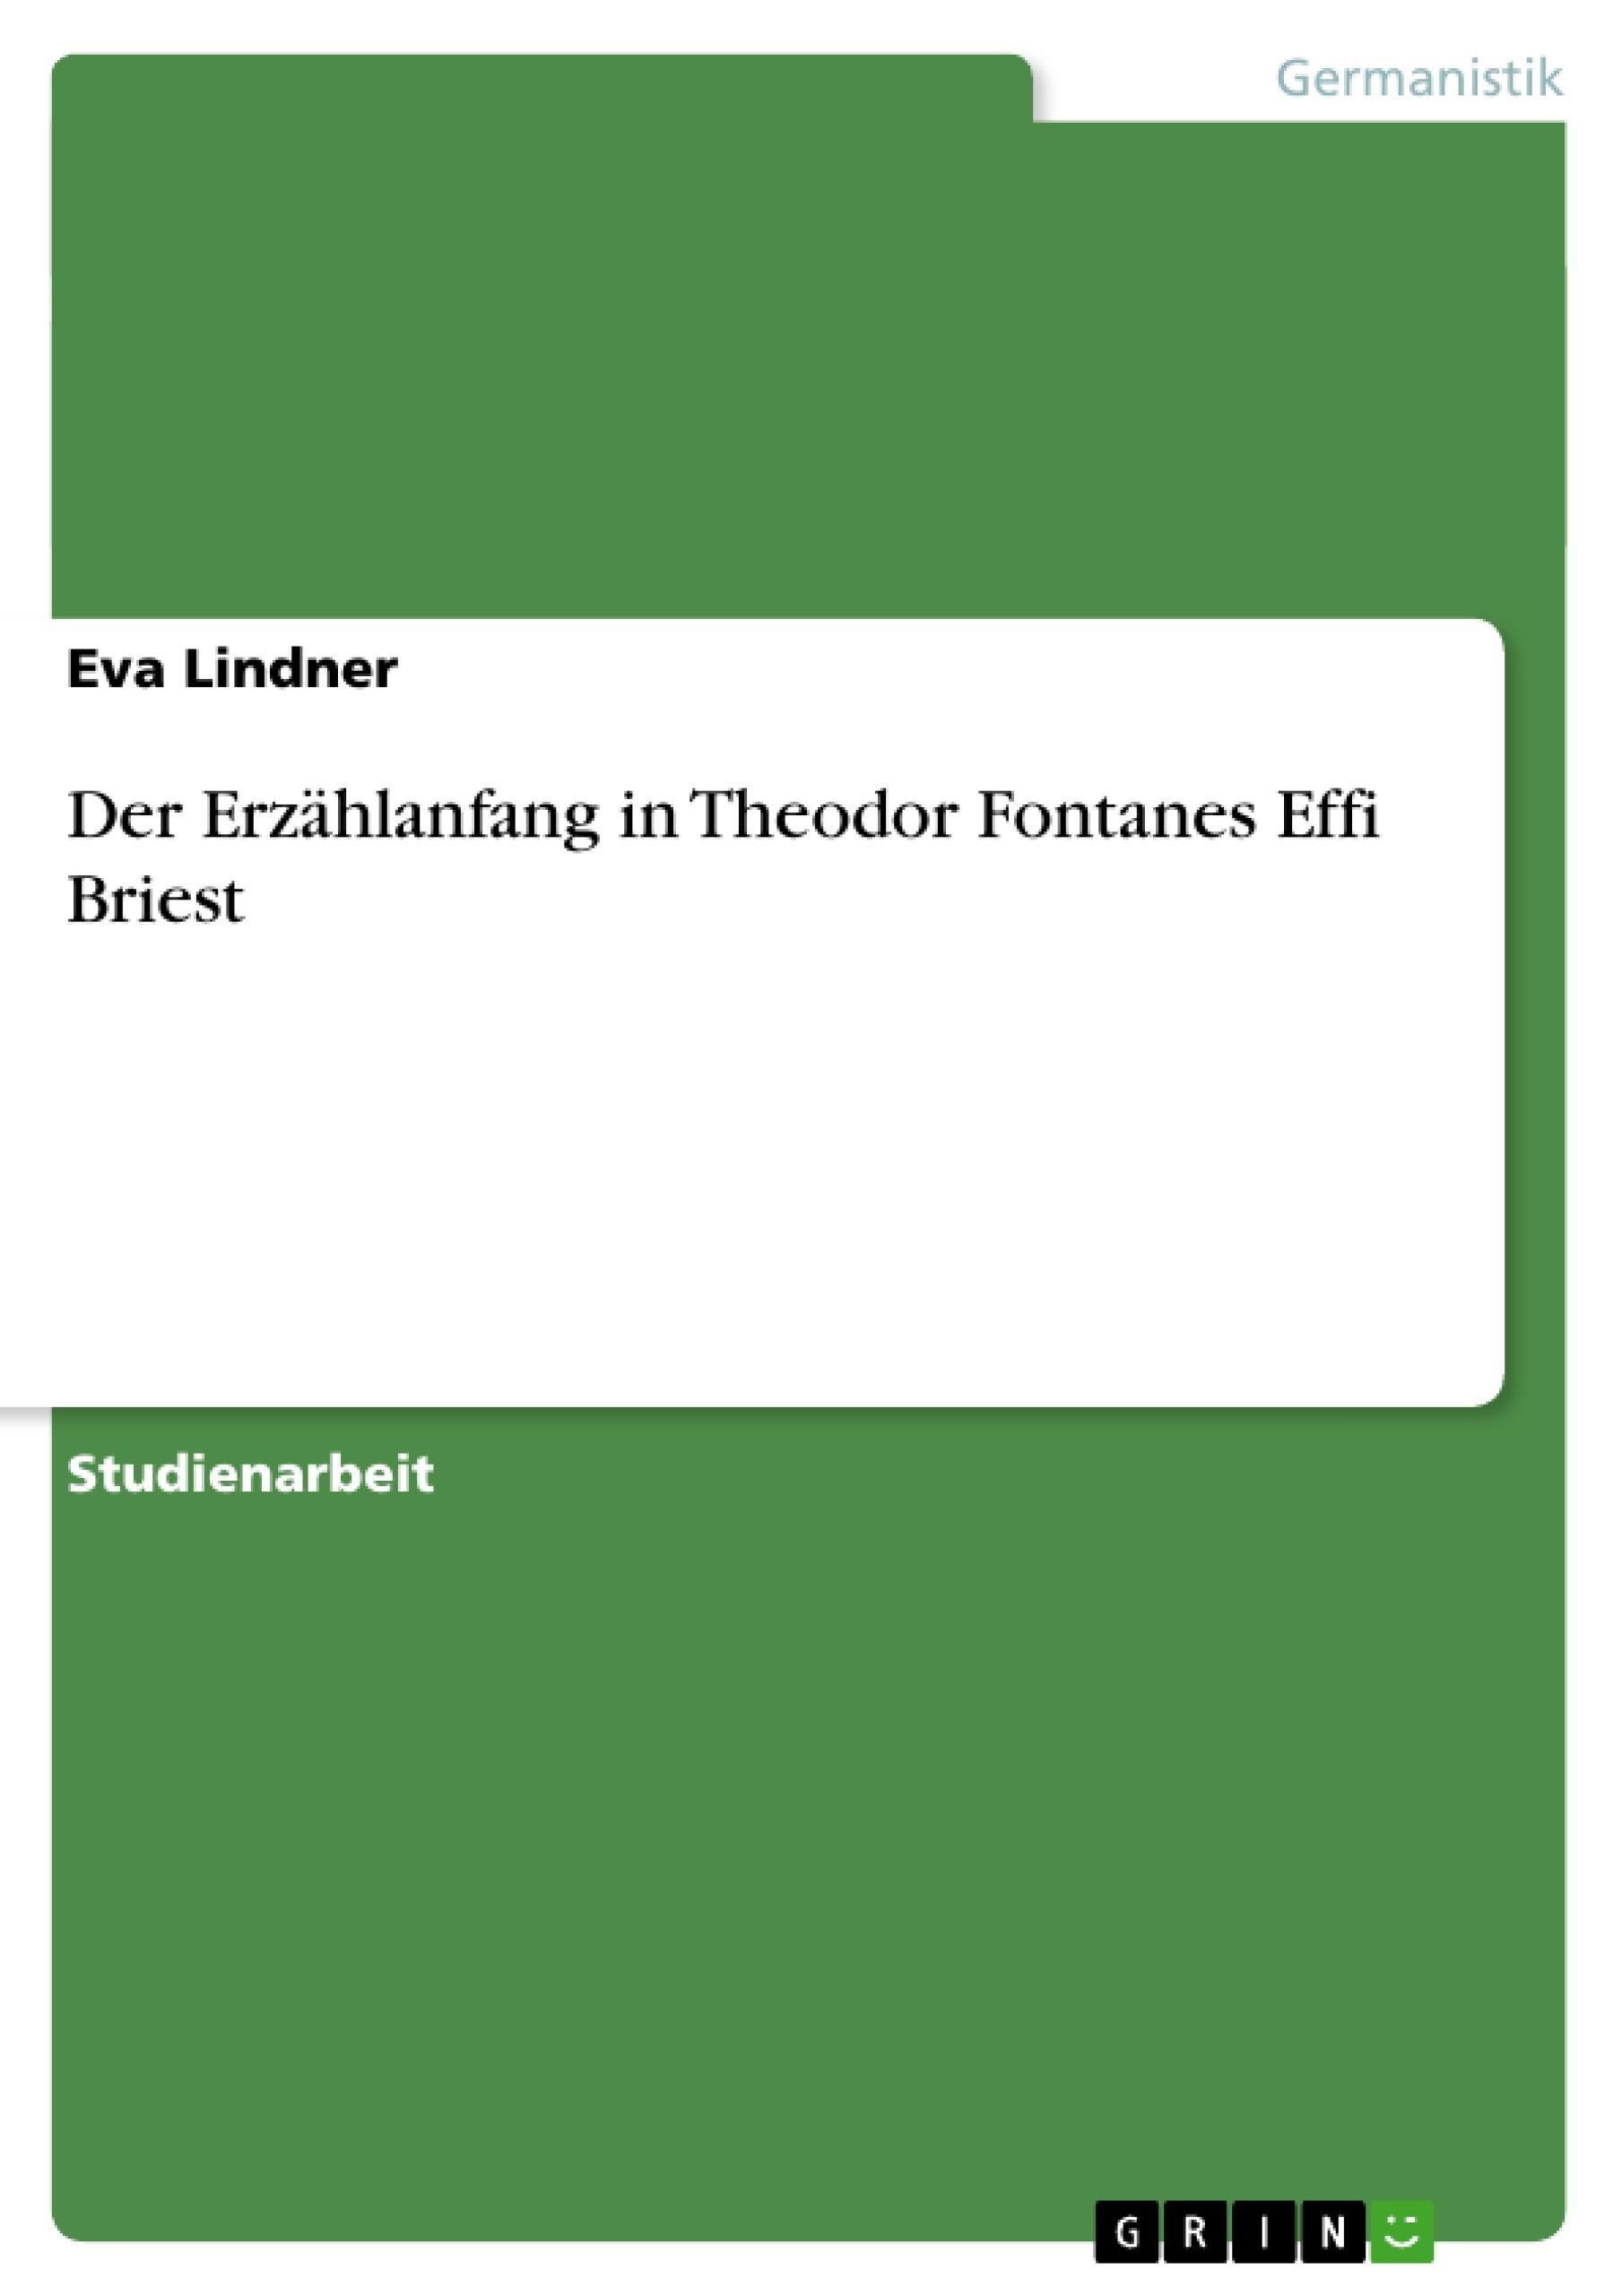 Titel: Der Erzählanfang in Theodor Fontanes Effi Briest